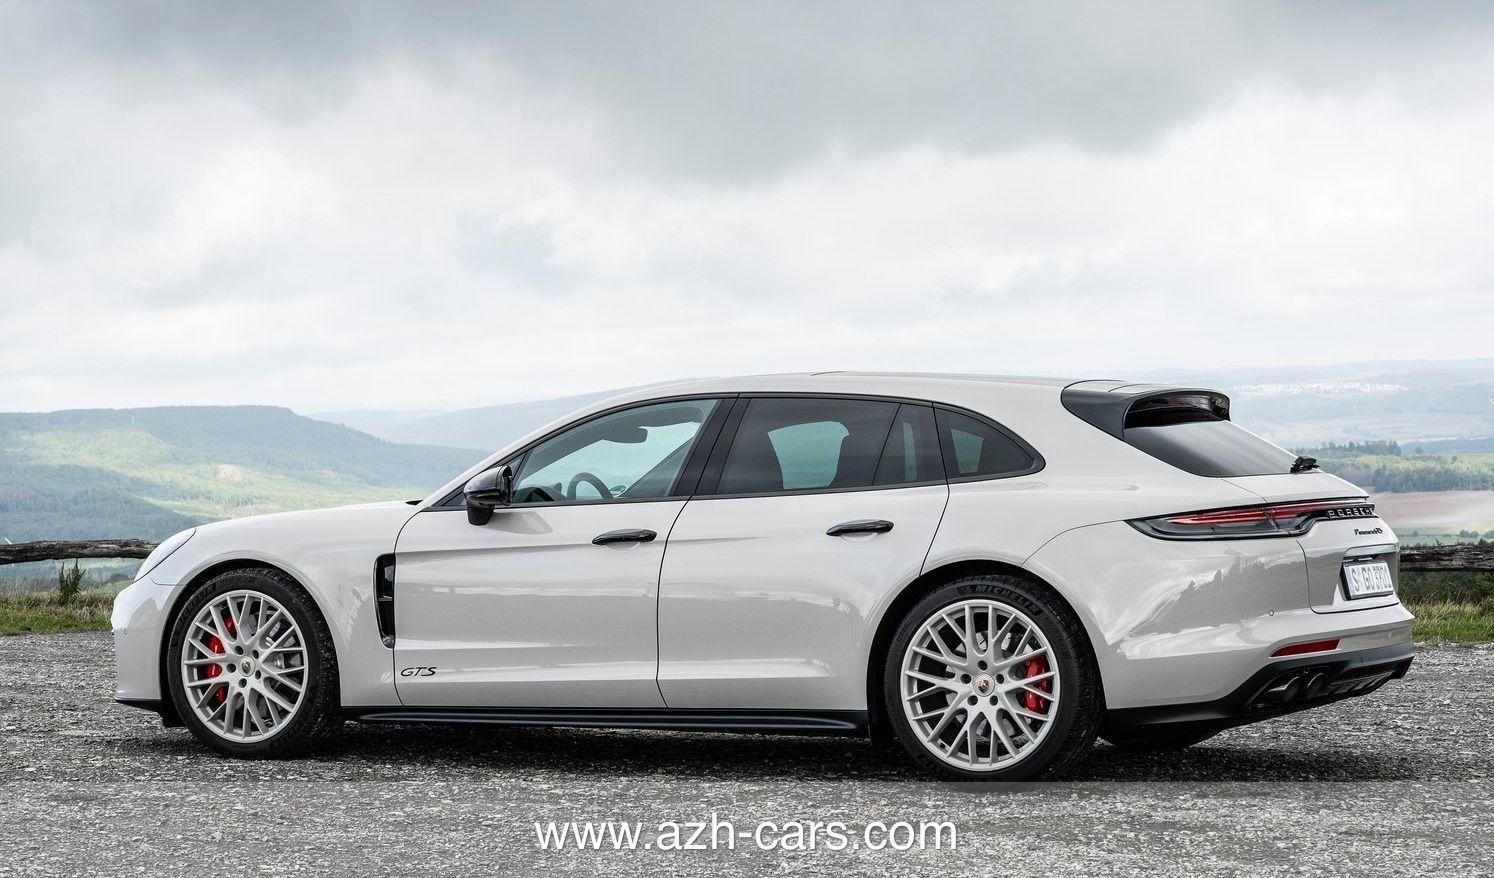 Porsche Panamera Gts Sport Turismo 2021 Porsche Panamera Porsche Panamera Sport Turismo